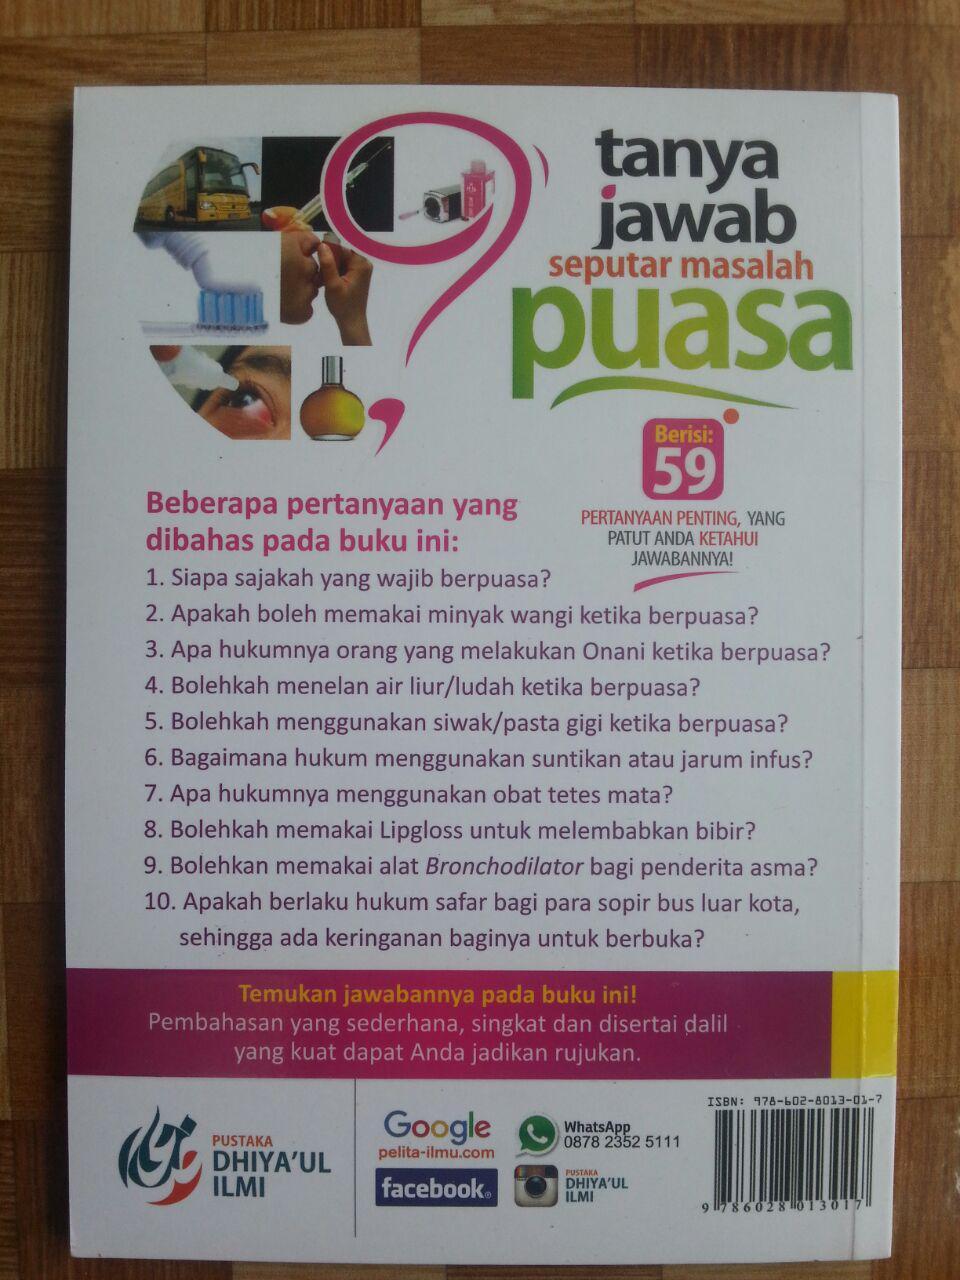 Buku Tanya Jawab Seputar Masalah Puasa cover